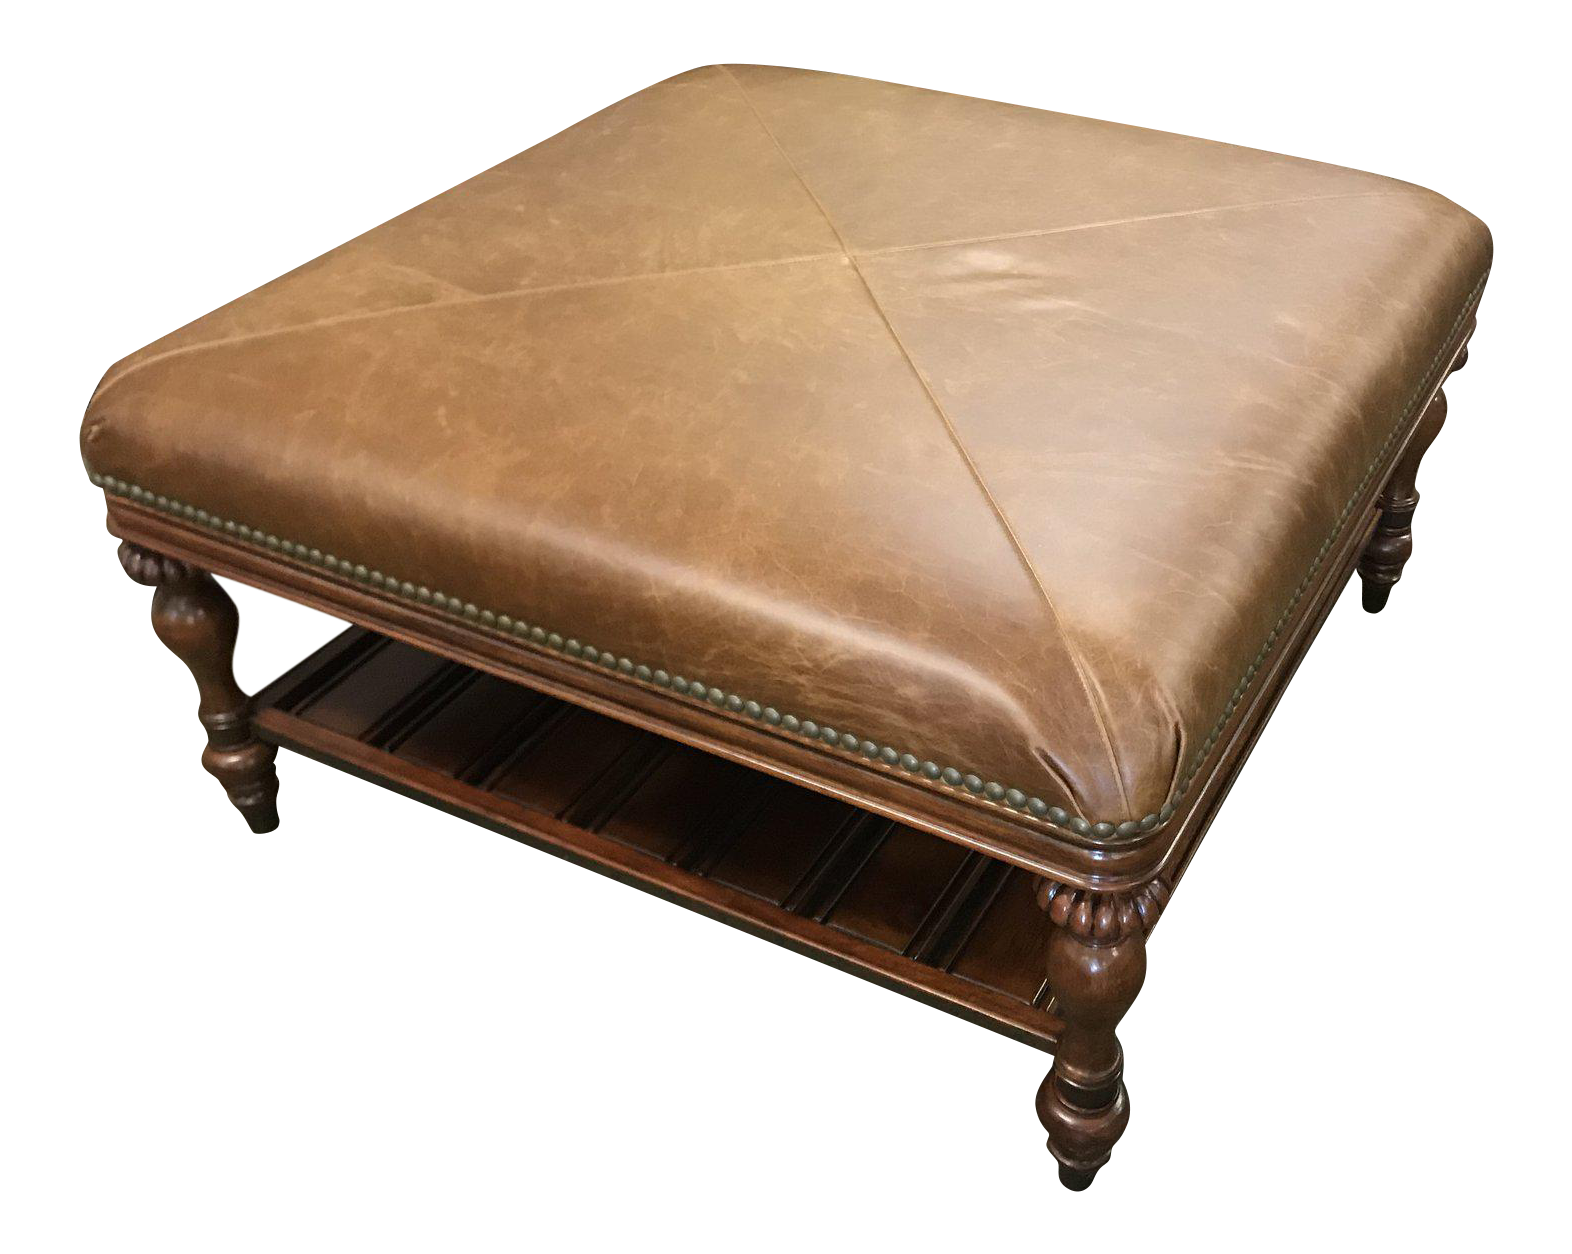 Thomasville Furniture Ernest Hemingway Masai Leather Square Oversized Ottoman With Shelf Chairish